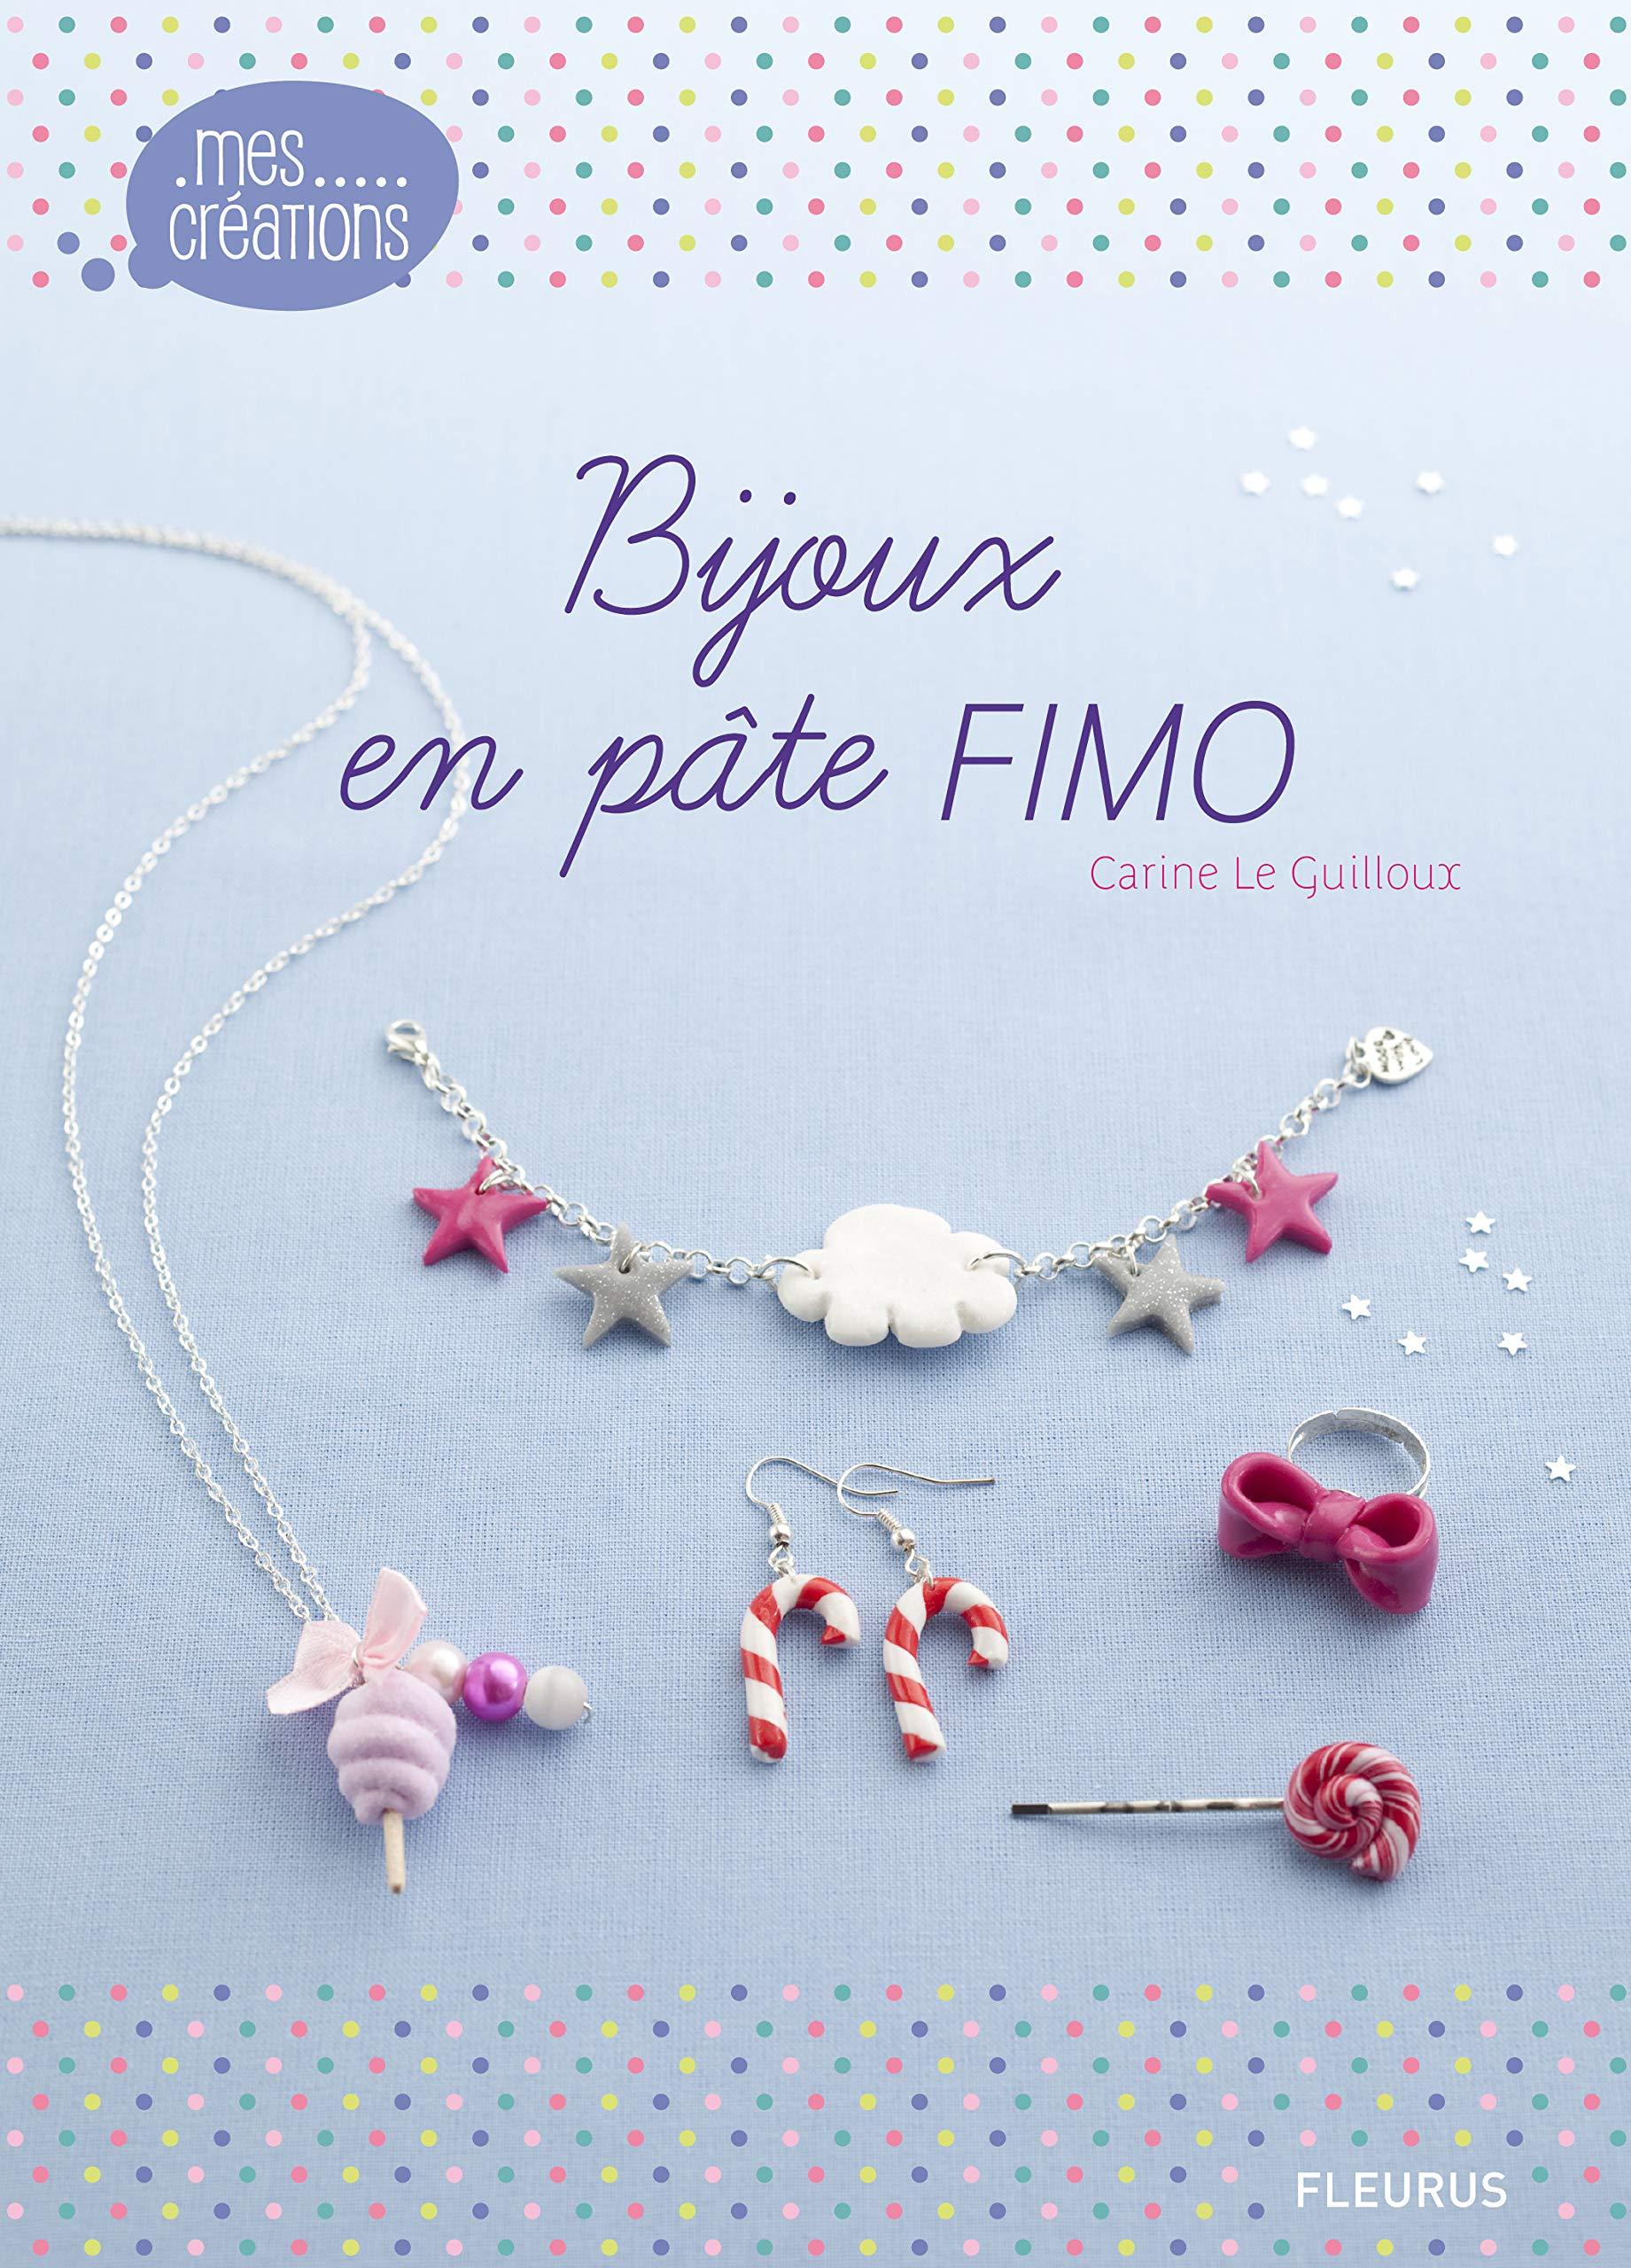 Bijoux En Pate Fimo 3 Amazon Ca Guilloux Carine Le Books